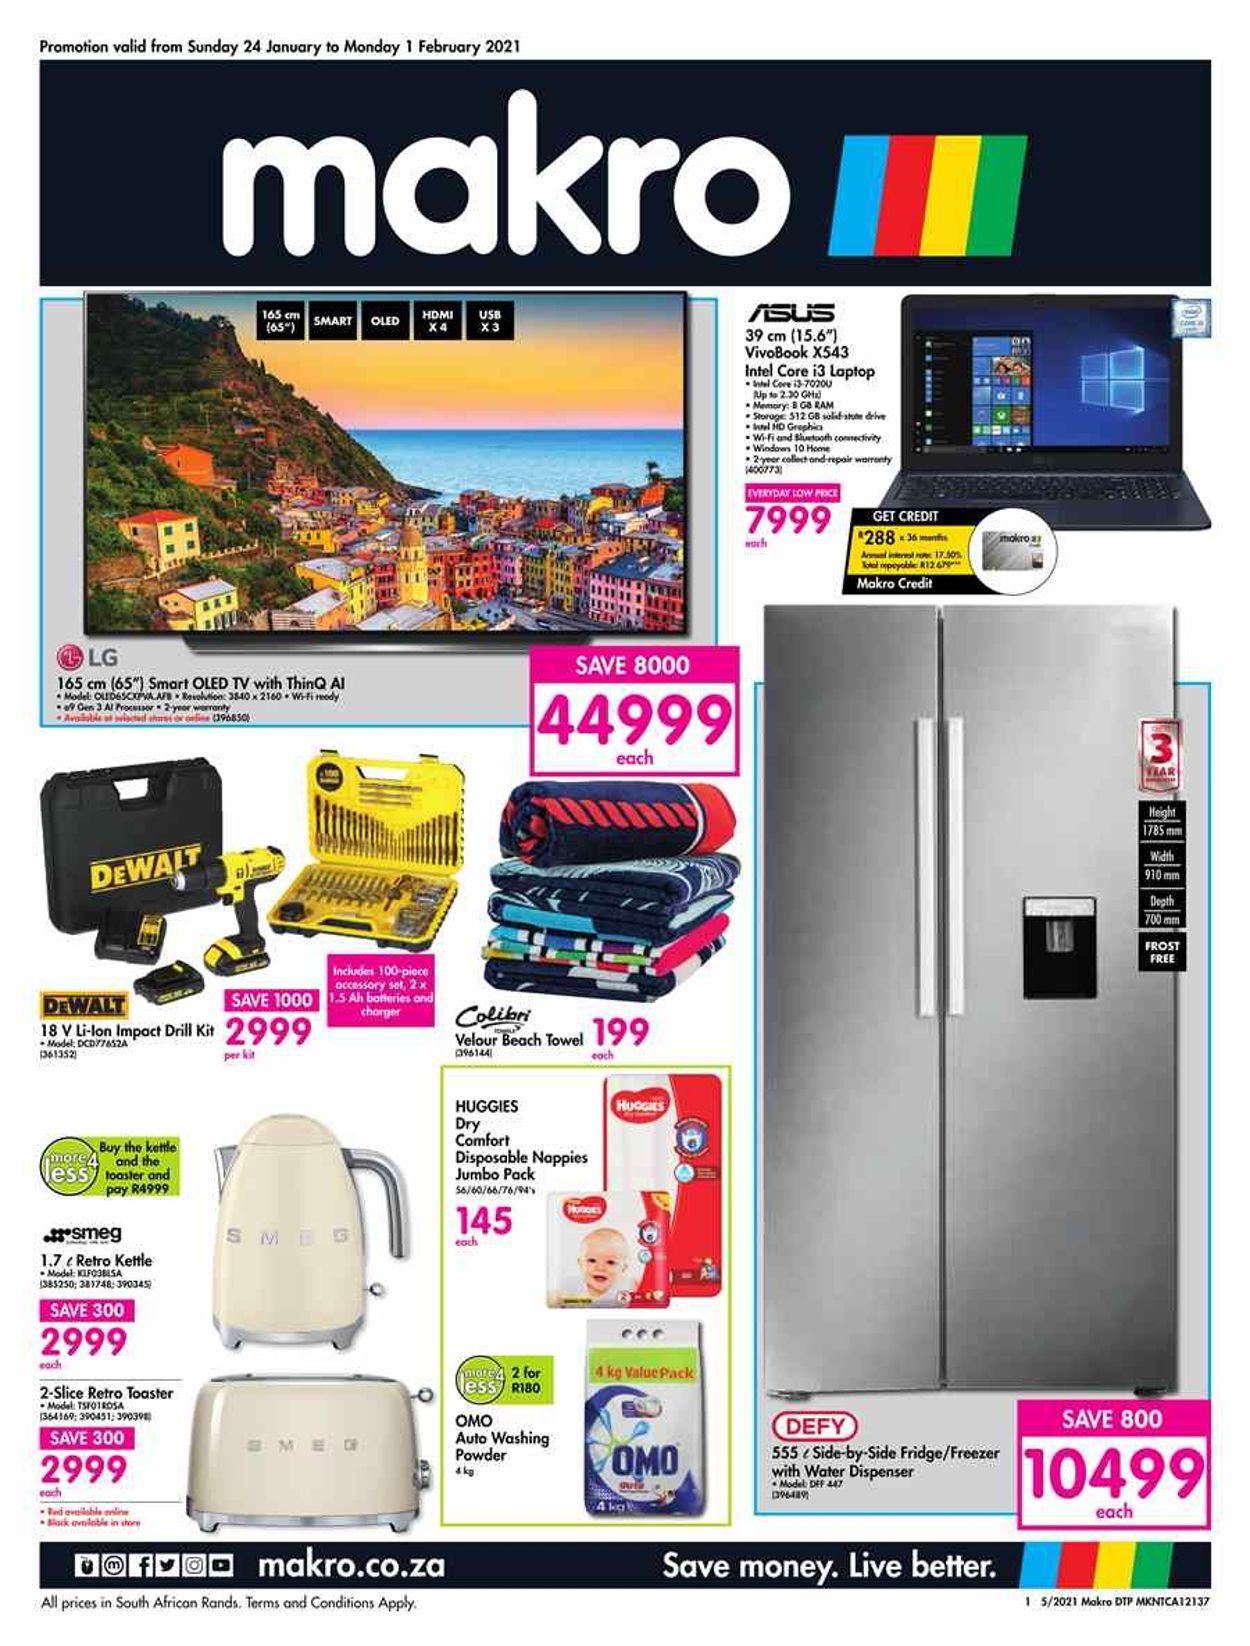 Makro Catalogue - 2021/01/24-2021/02/01